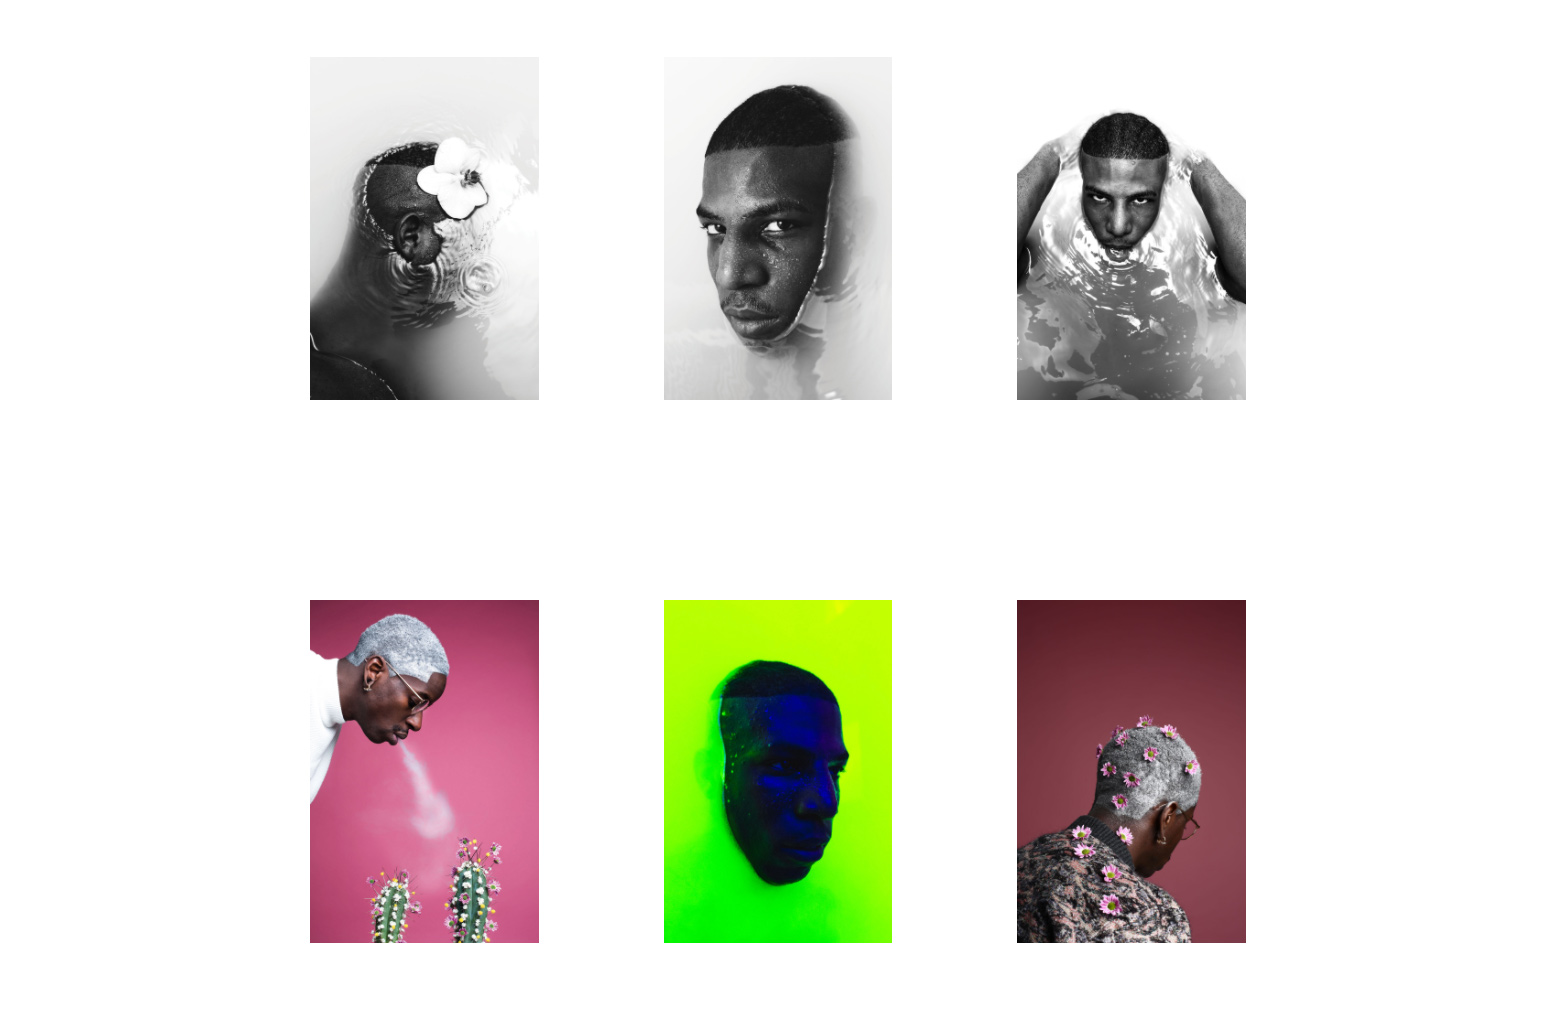 felicity-ben-rejeb-price-realisatrice-photographe-clips-rap-francais-site-internet-portfolio-photos